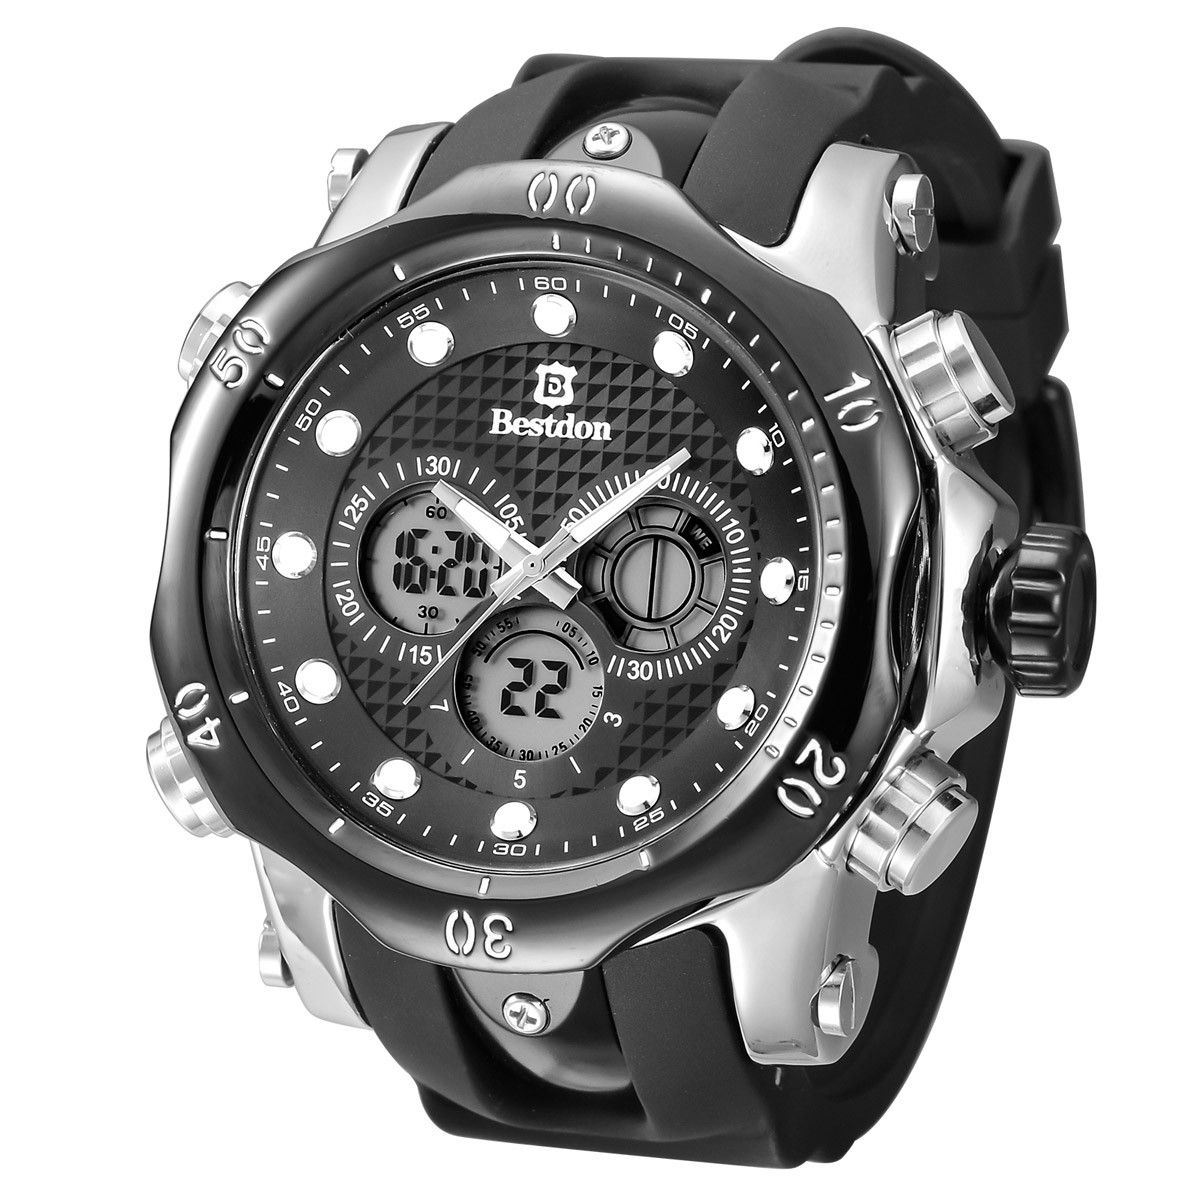 BESTDON BD5515G Men's Quartz & LED Electronics Dual Time Display Wrist Watch